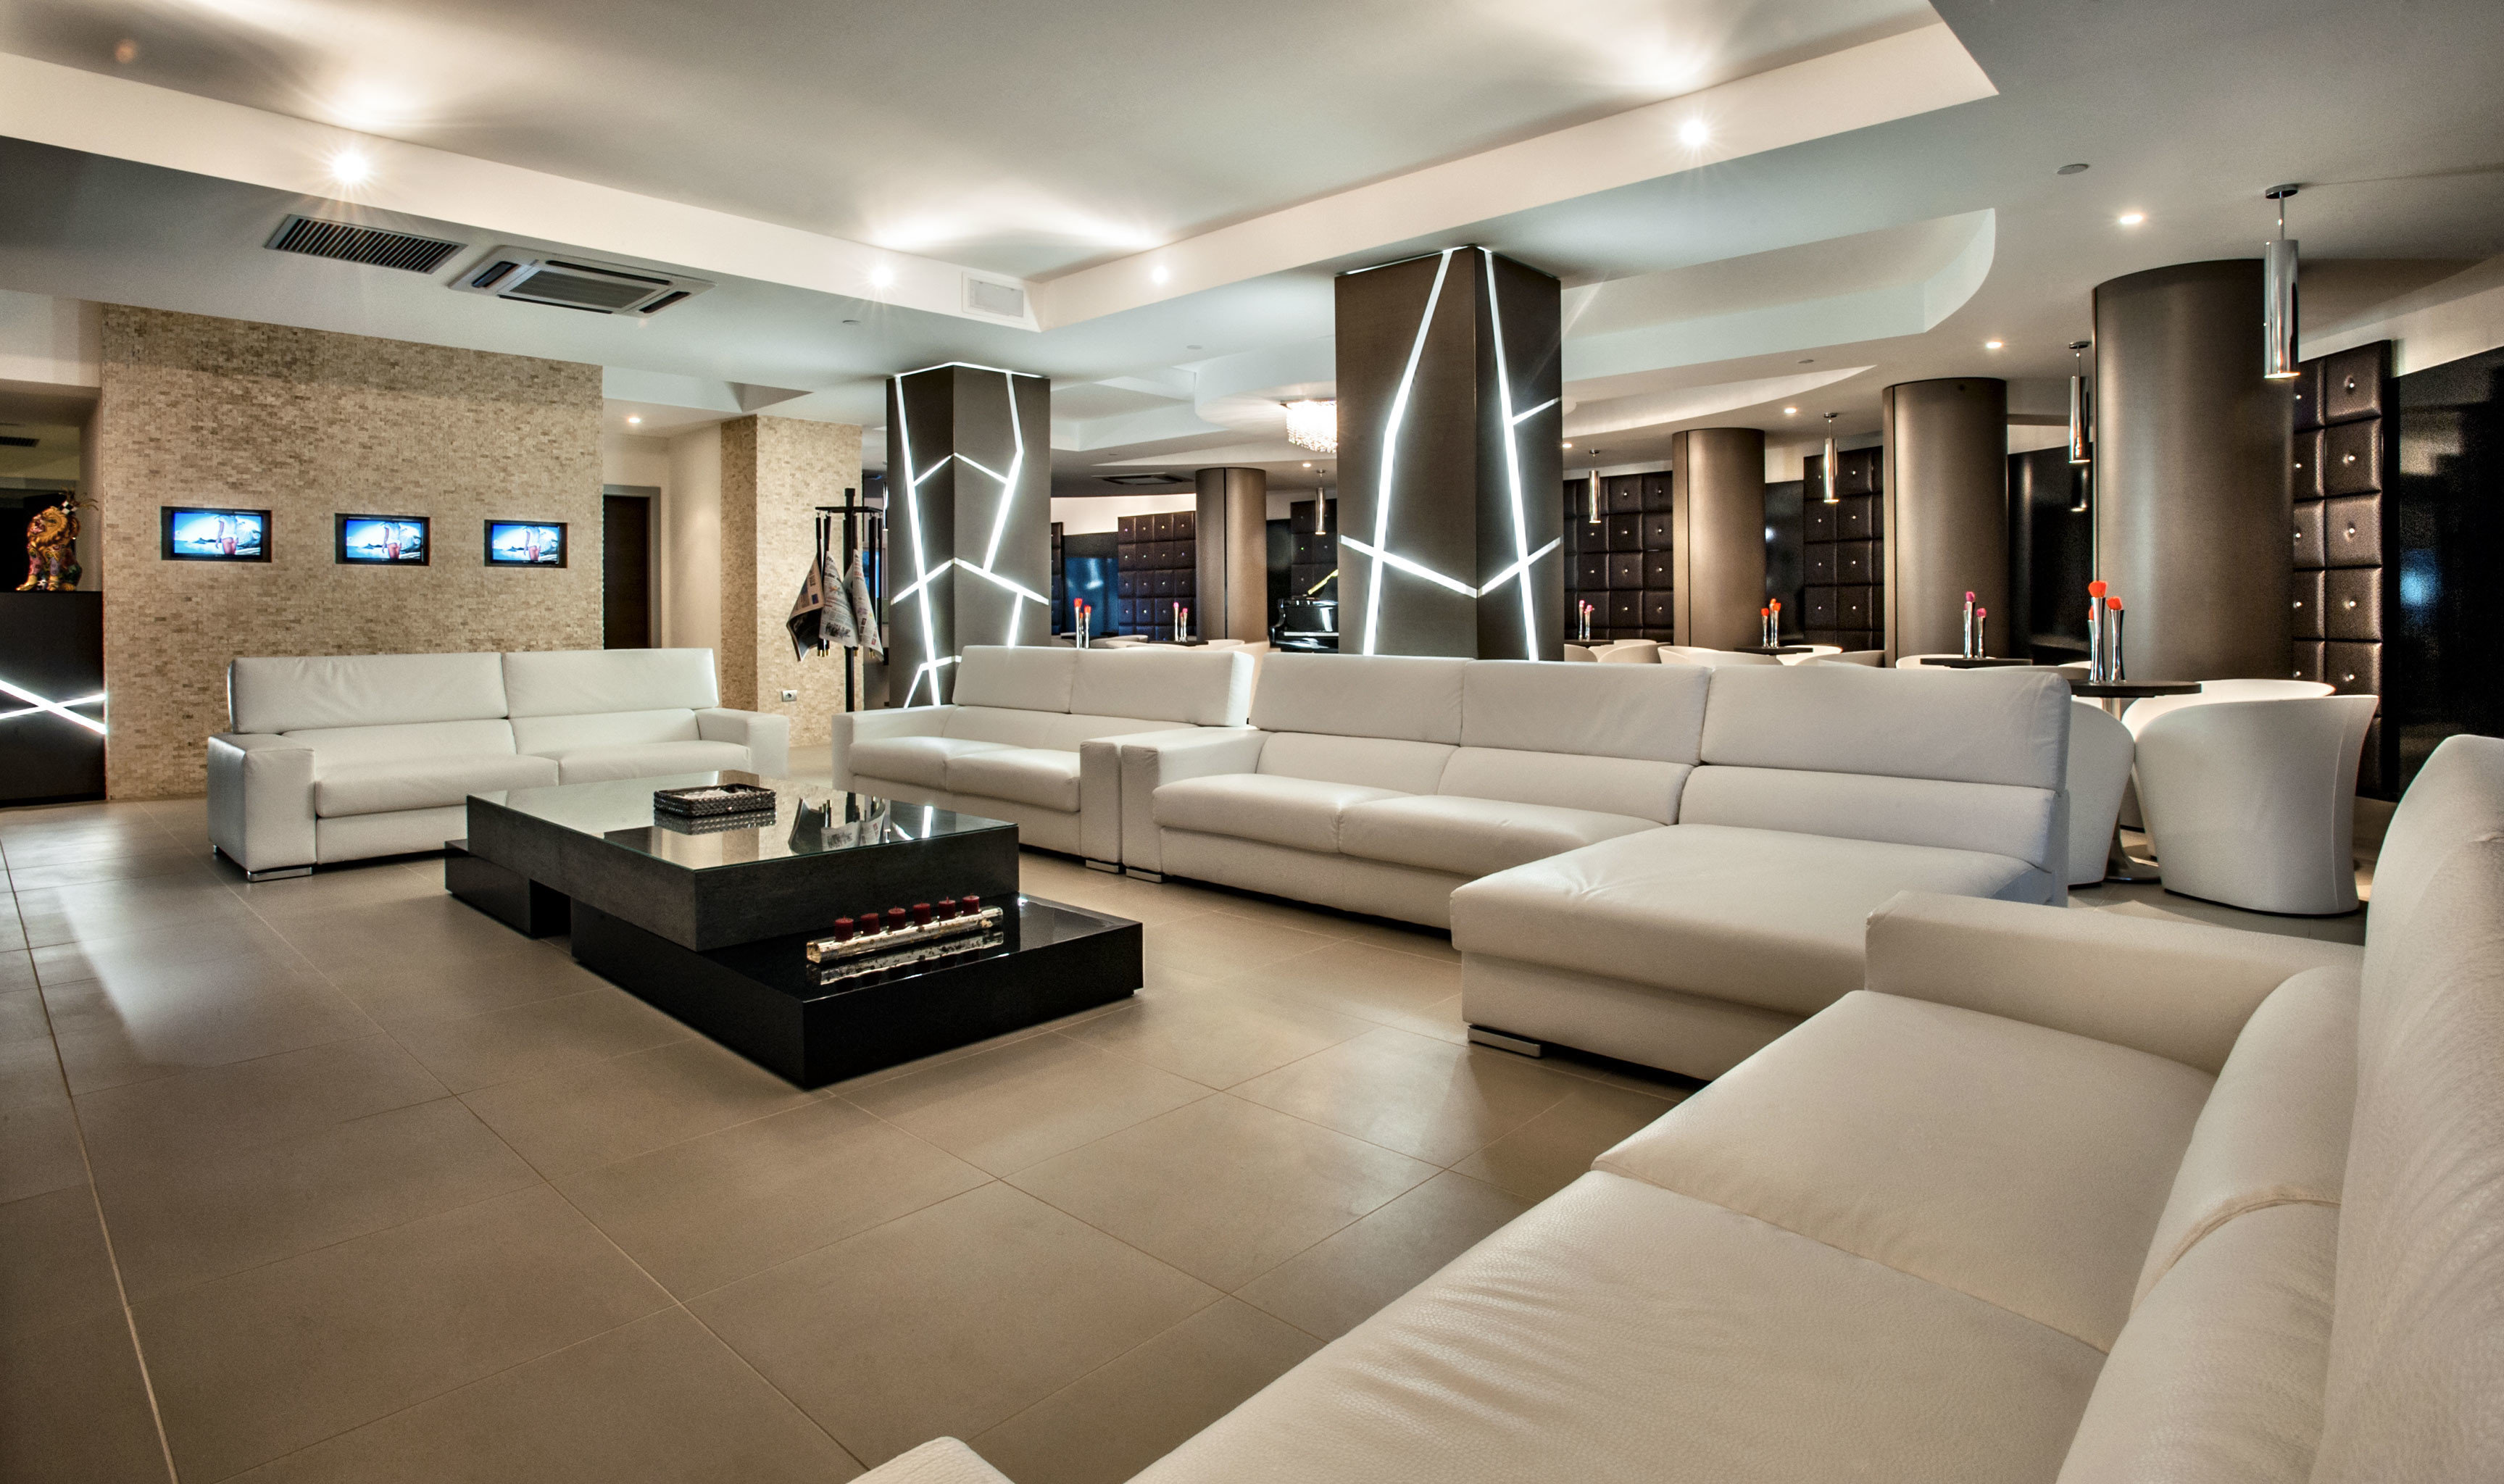 Hip Lounge Luxury sofa living room property white Lobby home yacht condominium vehicle lighting passenger ship mansion Modern